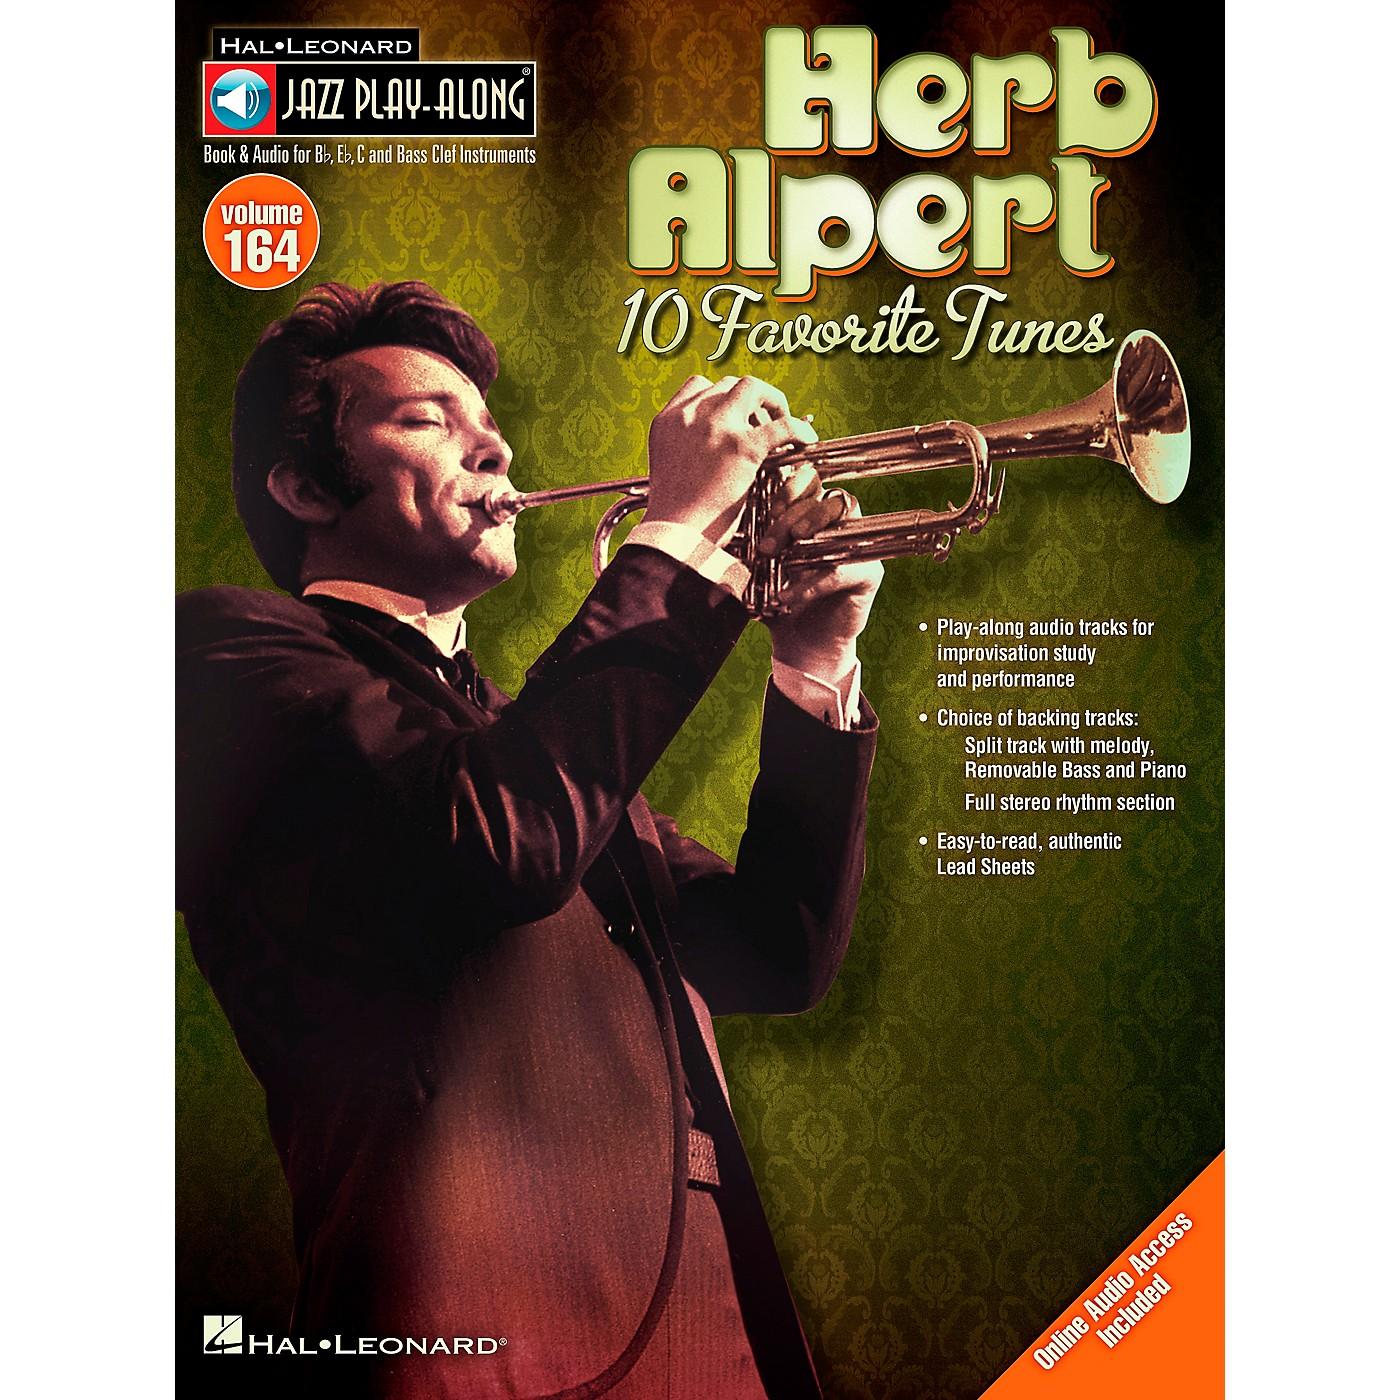 Hal Leonard Herb Alpert - Jazz Play-Along Volume 164 Book/CD thumbnail